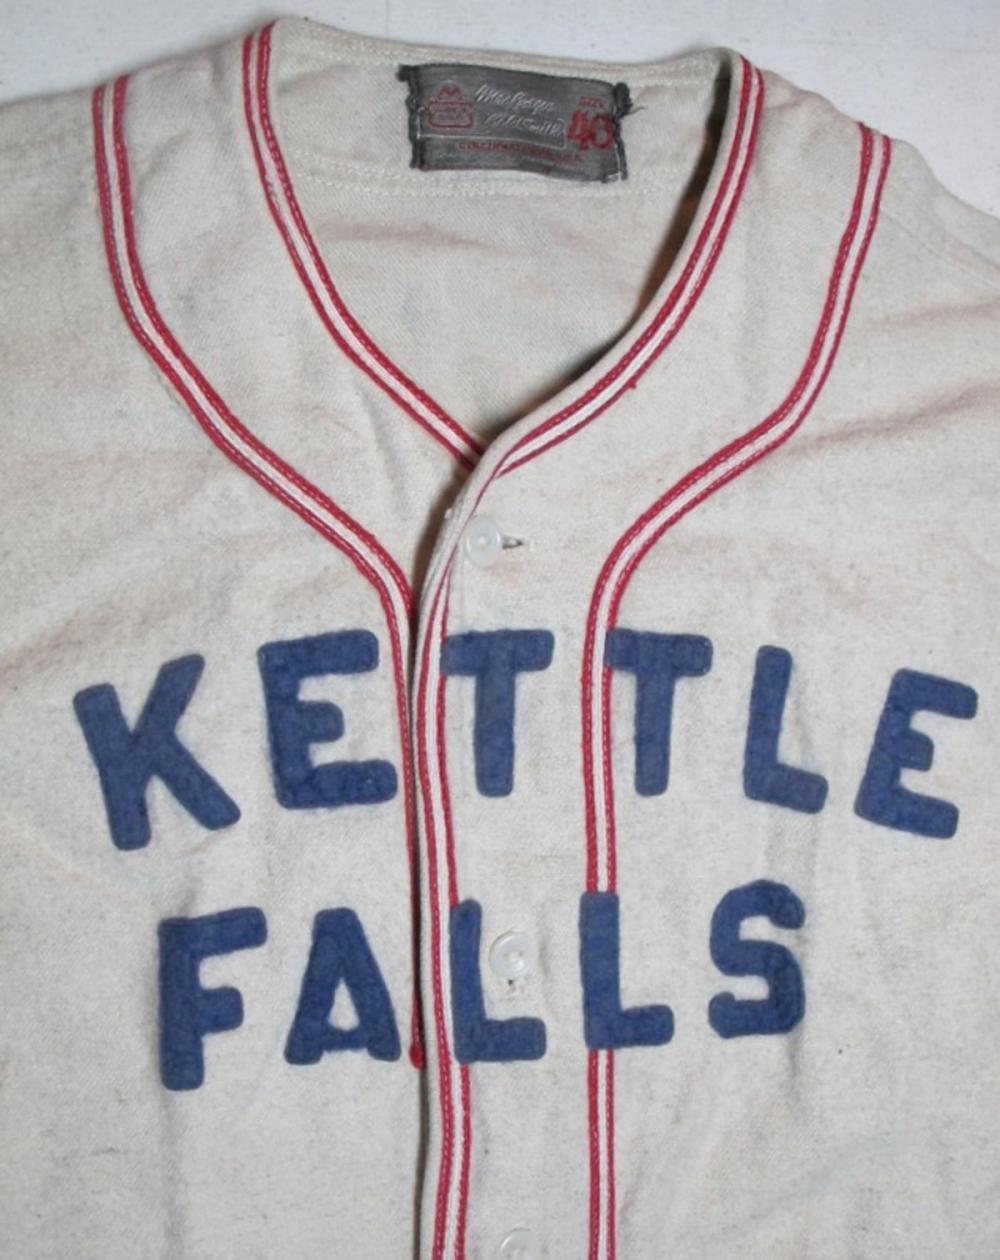 Lot 75: CIRCA 1950 KETTLE FALLS WA MACGREGOR GOLDSMITH MCLEODS DRUG WOOL BASEBALL UNIFORM JERSEY